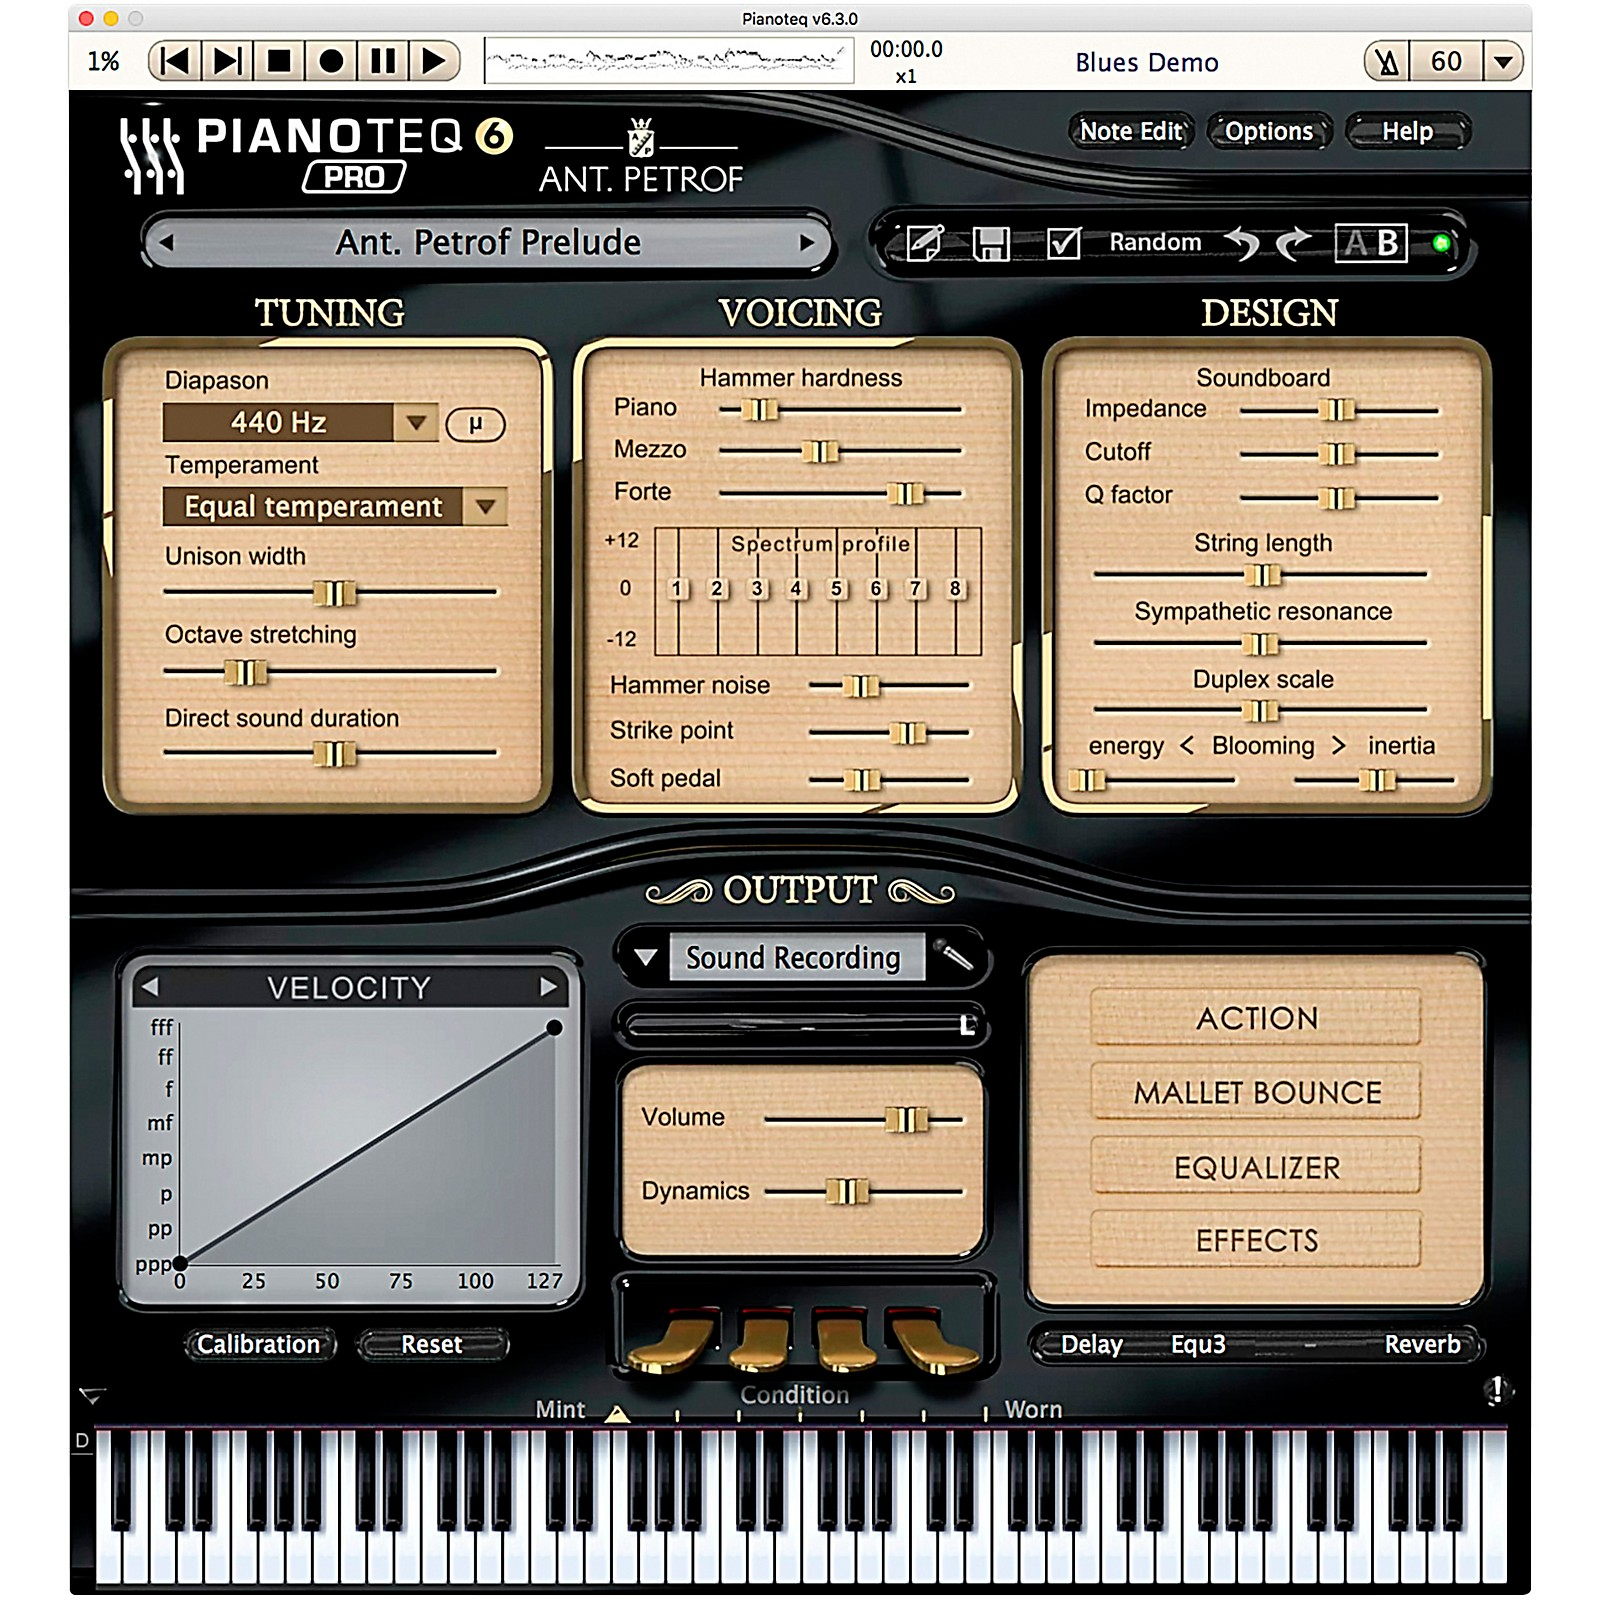 Pianoteq Ant. Petrof 275 GP Software Download